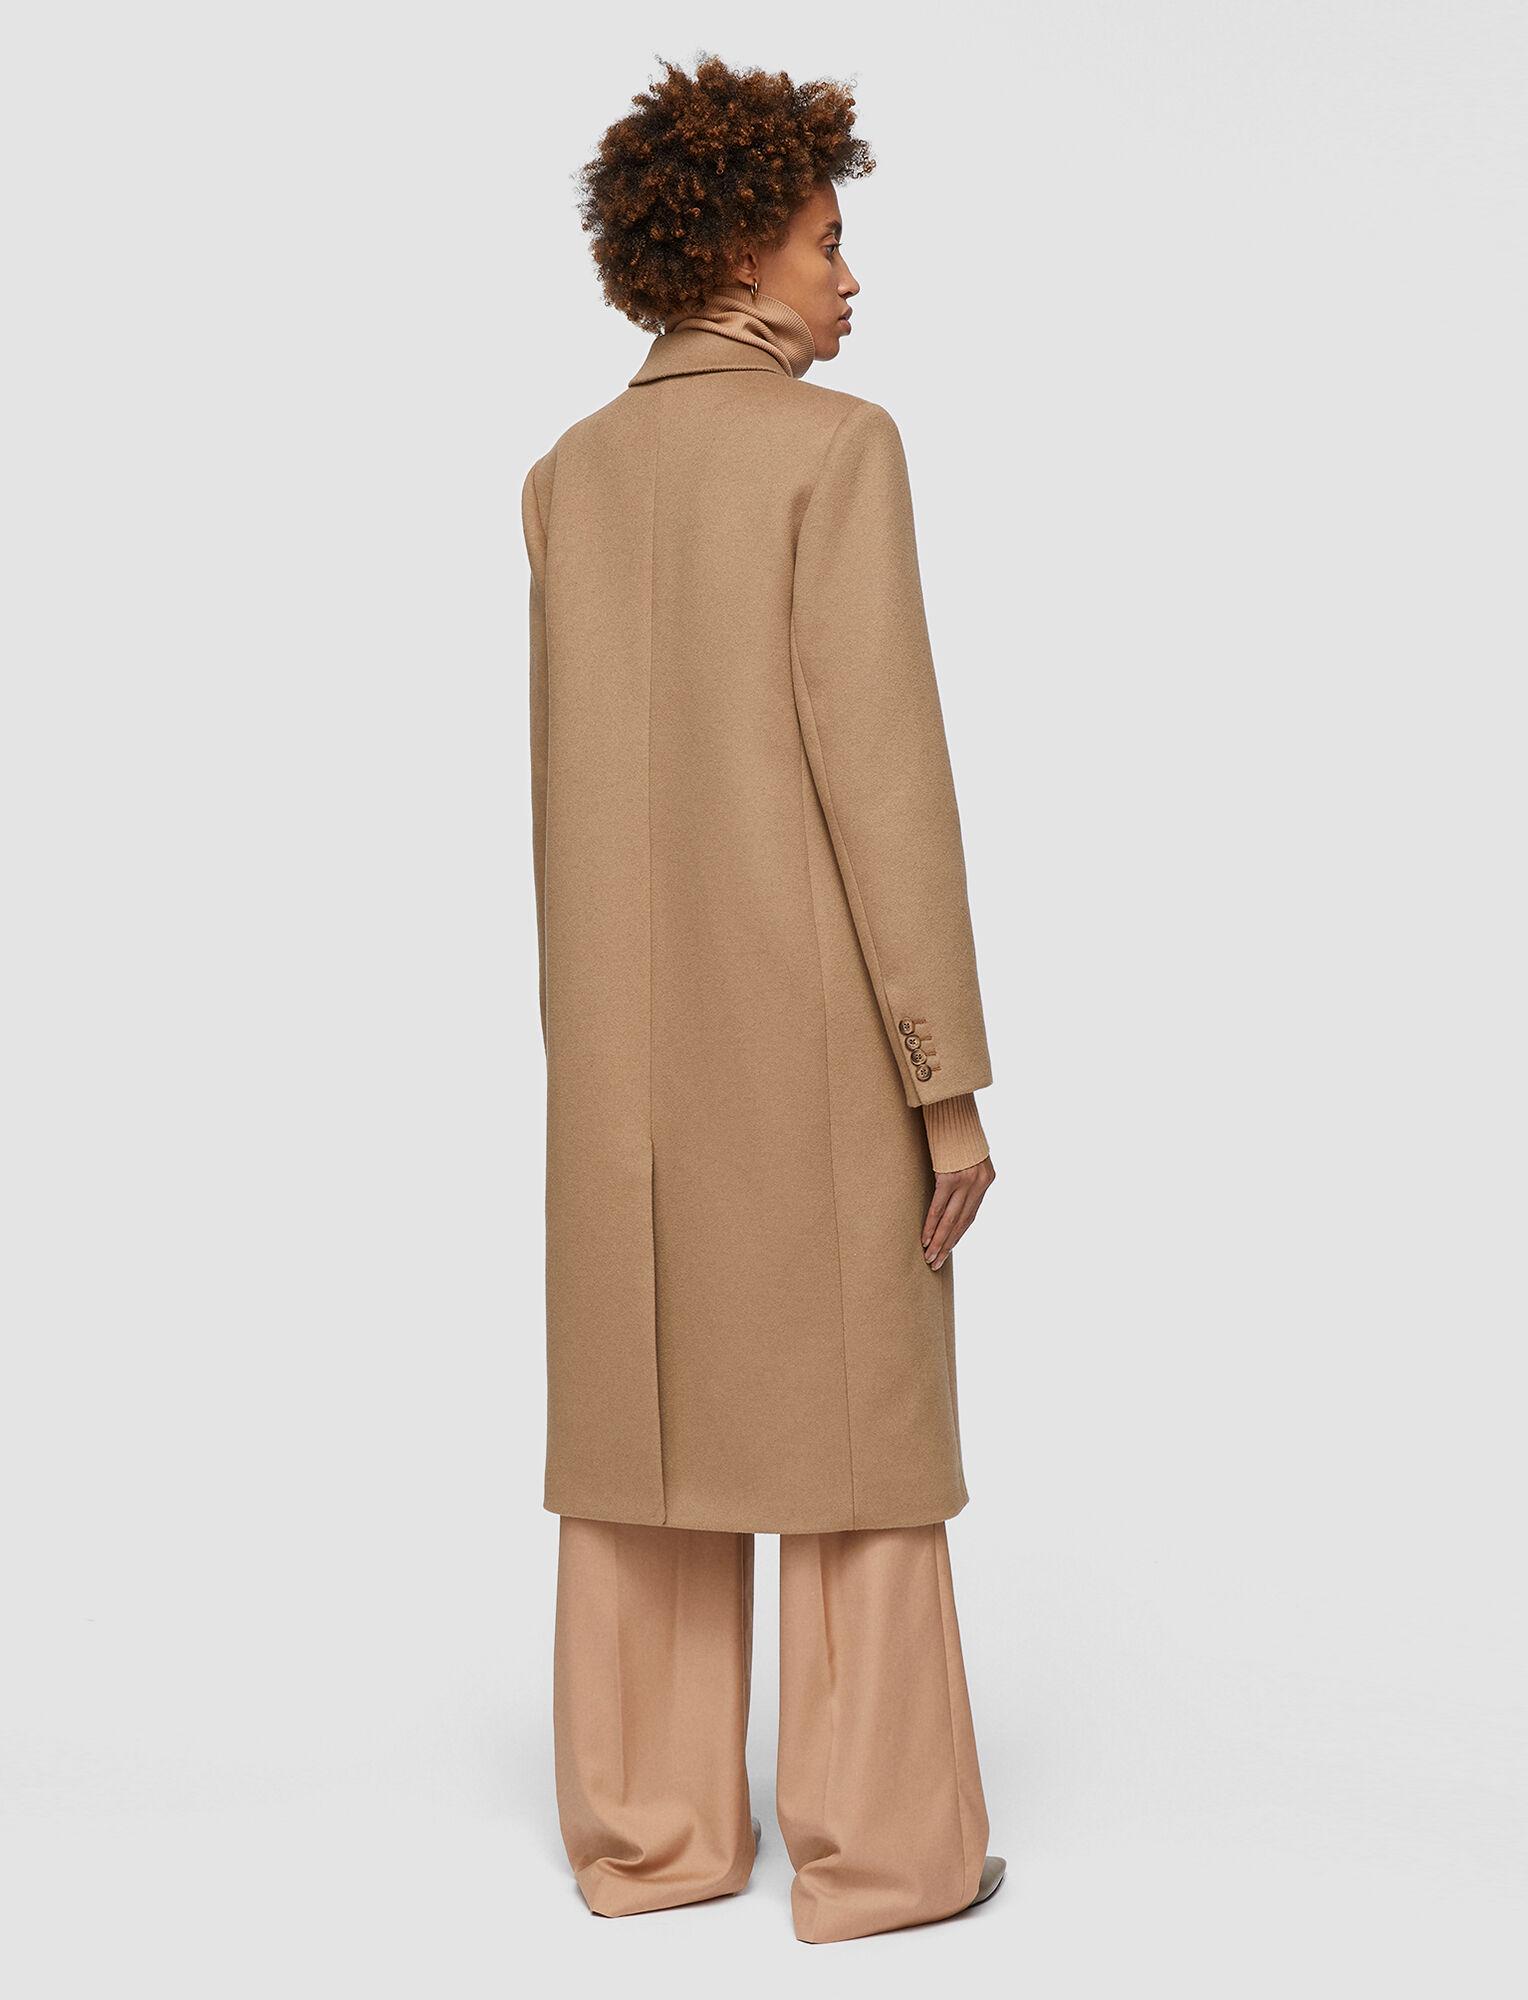 Joseph, Wool Coating Camia Coat, in Camel